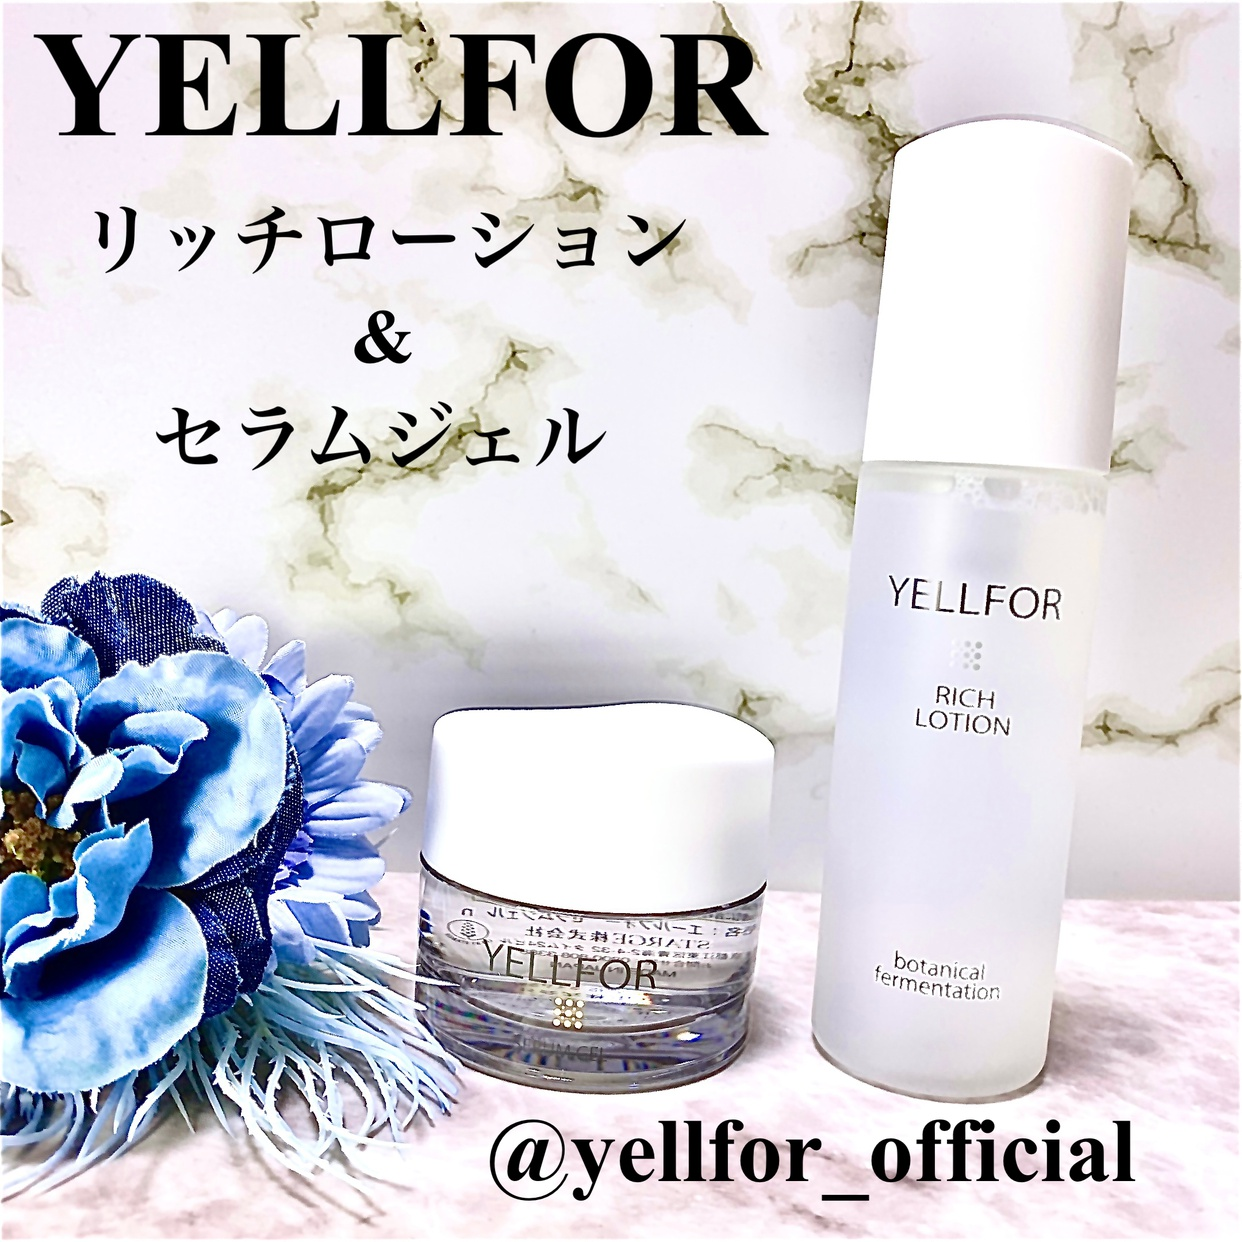 YELLFOR(エールフォー) リッチローションを使ったkana_cafe_timeさんのクチコミ画像3